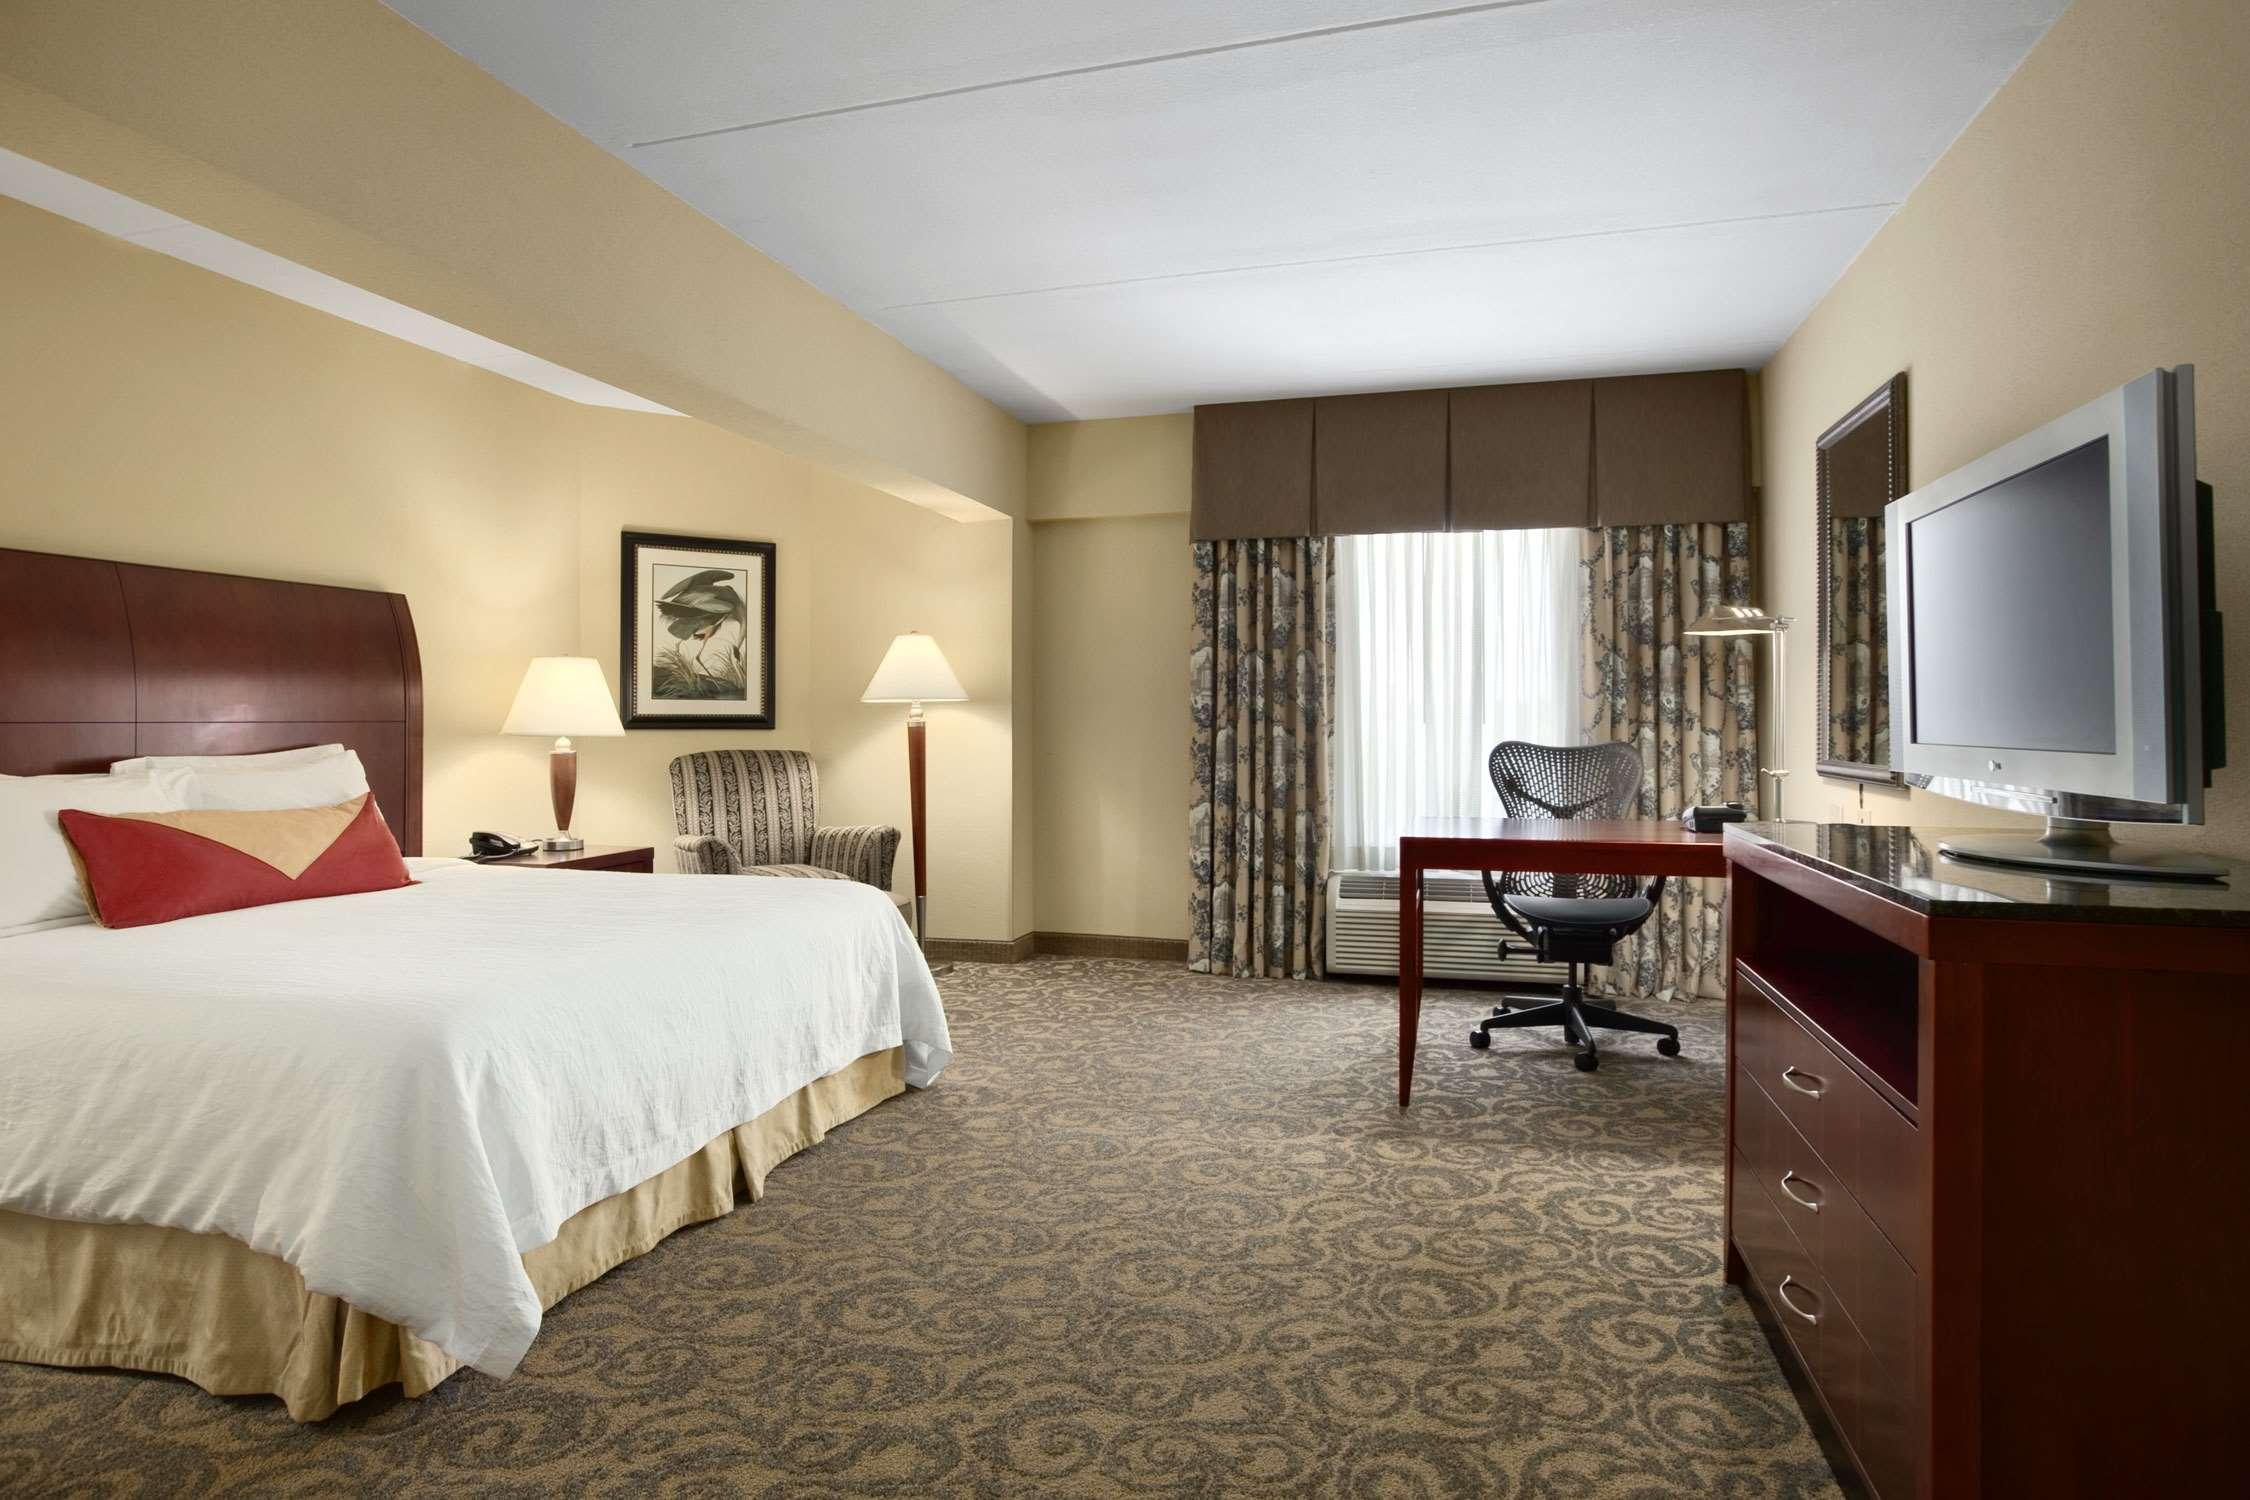 Hilton Garden Inn Champaign/ Urbana image 9